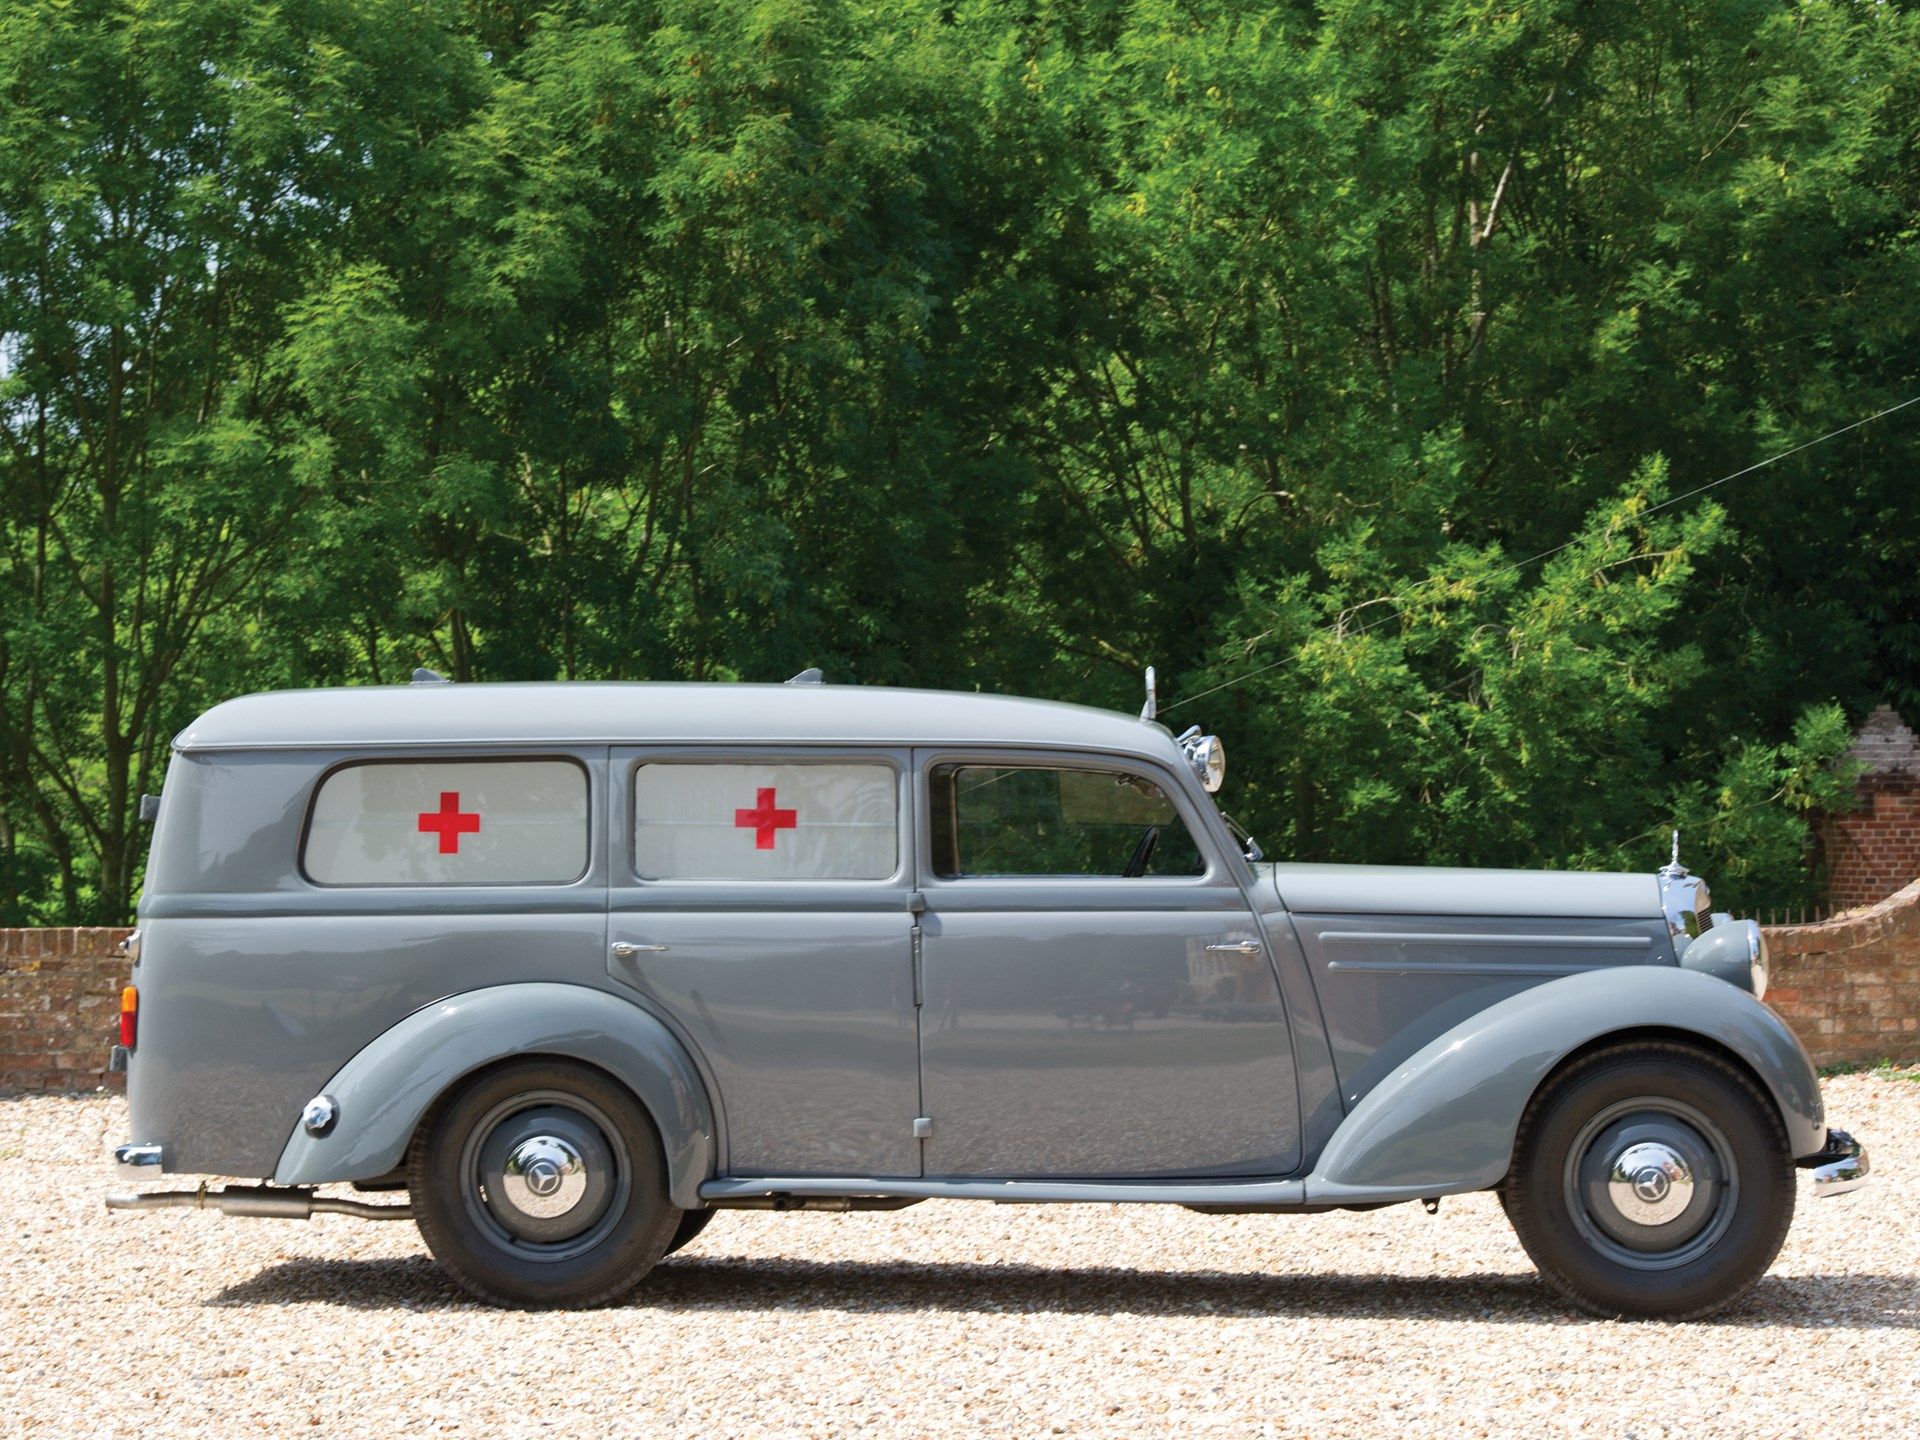 RM Sotheby's - 1954 Mercedes-Benz 170 S-V Ambulance | London